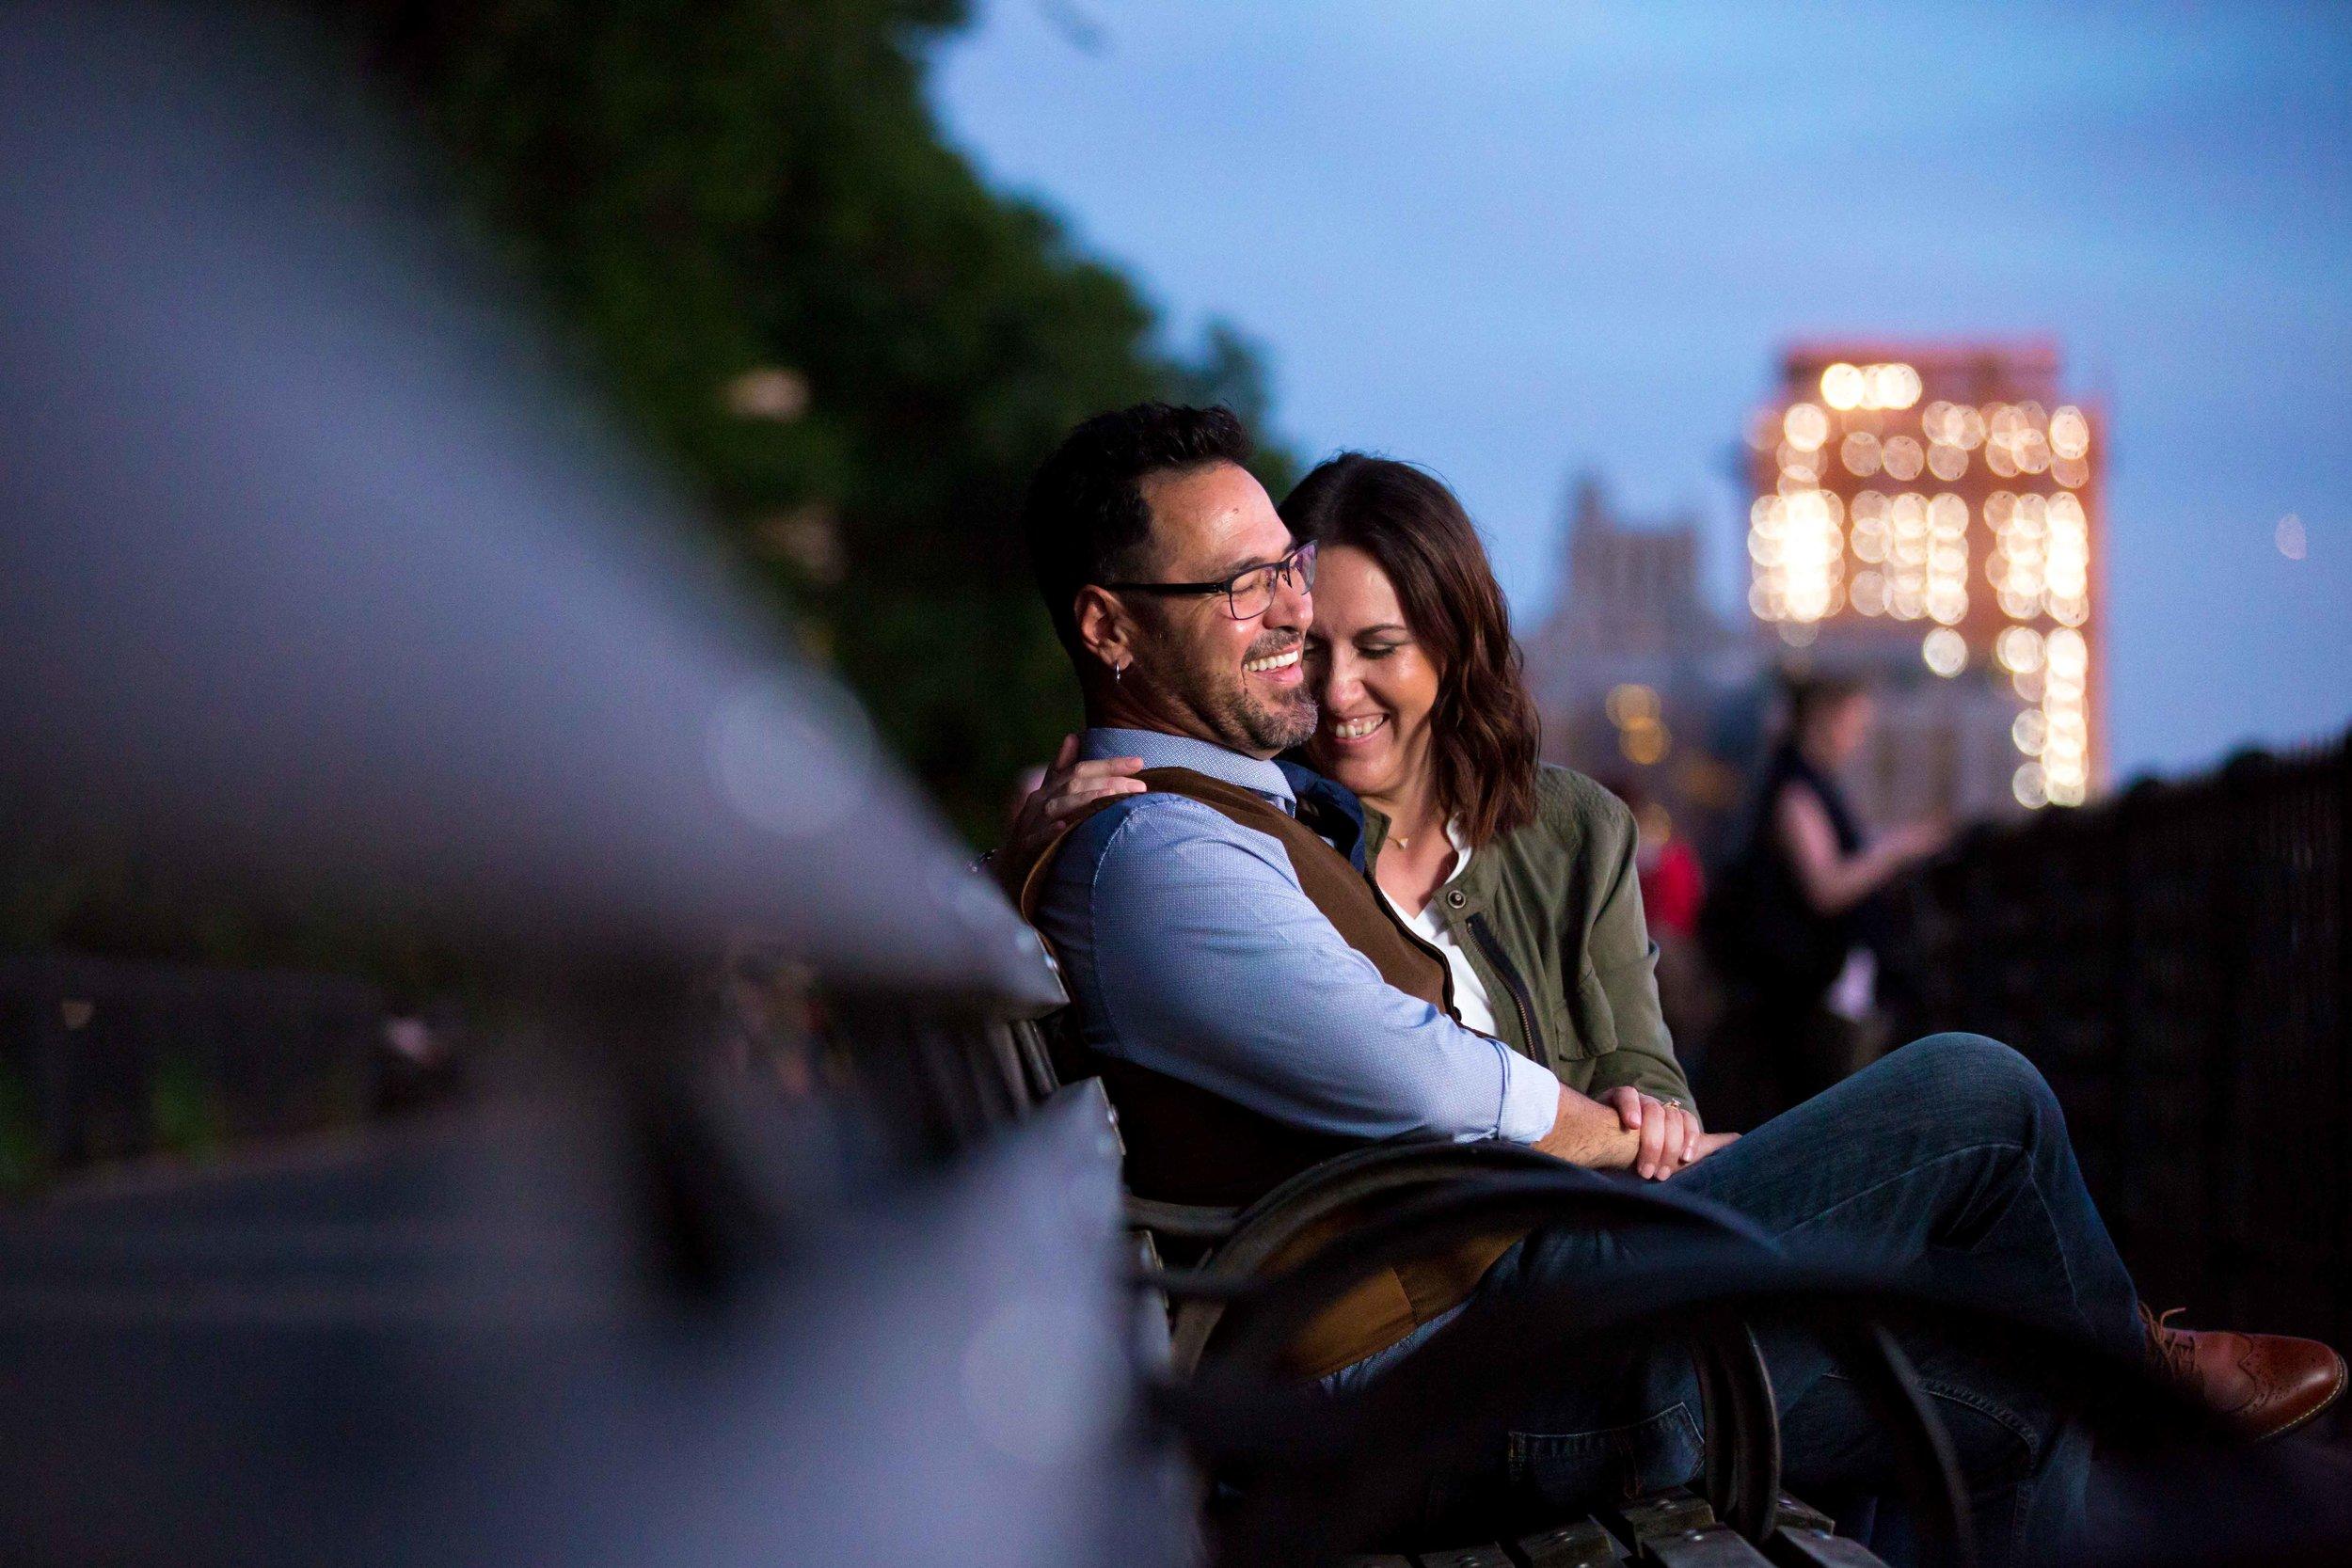 DUMBO Brooklyn Bridge Heights Promenade Anniversary Photo Shoot Session NYC Wedding Photographer-17.jpg